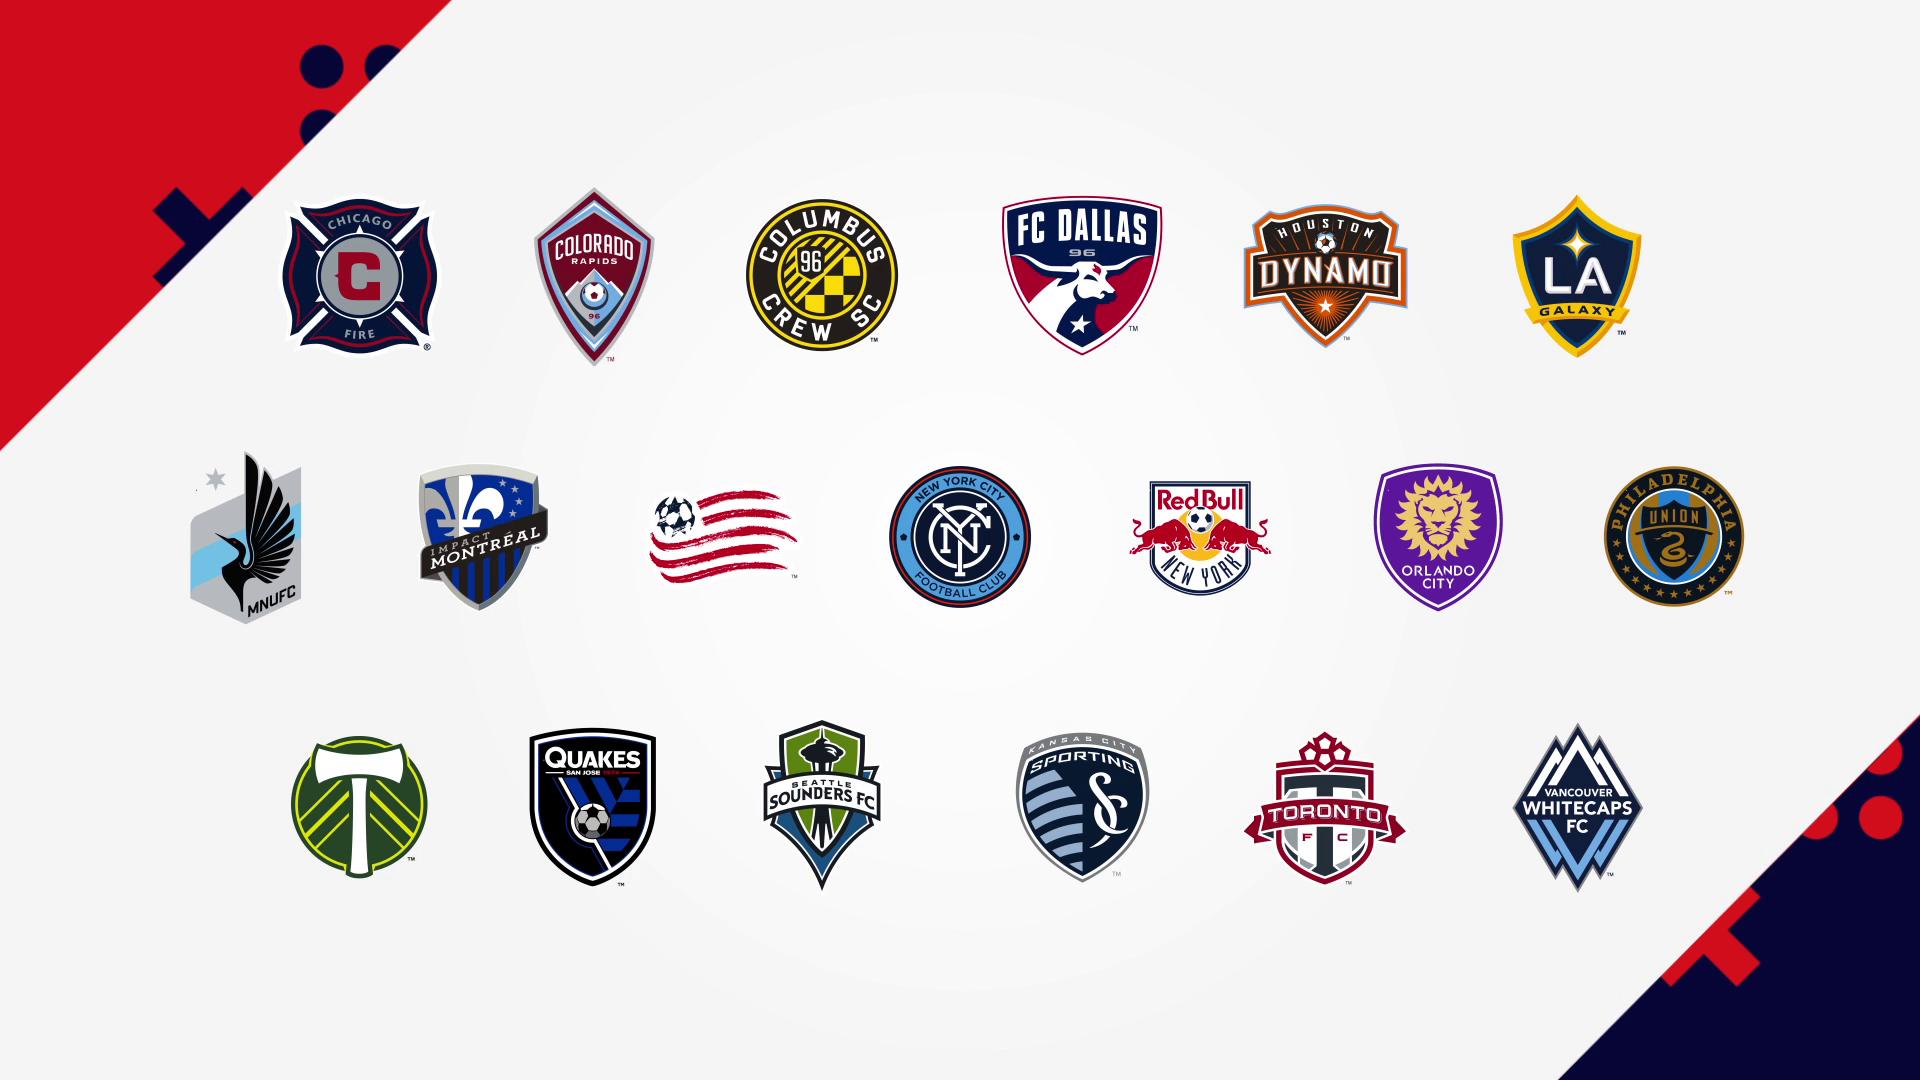 FIFA 18 eMLS - MLS club logos